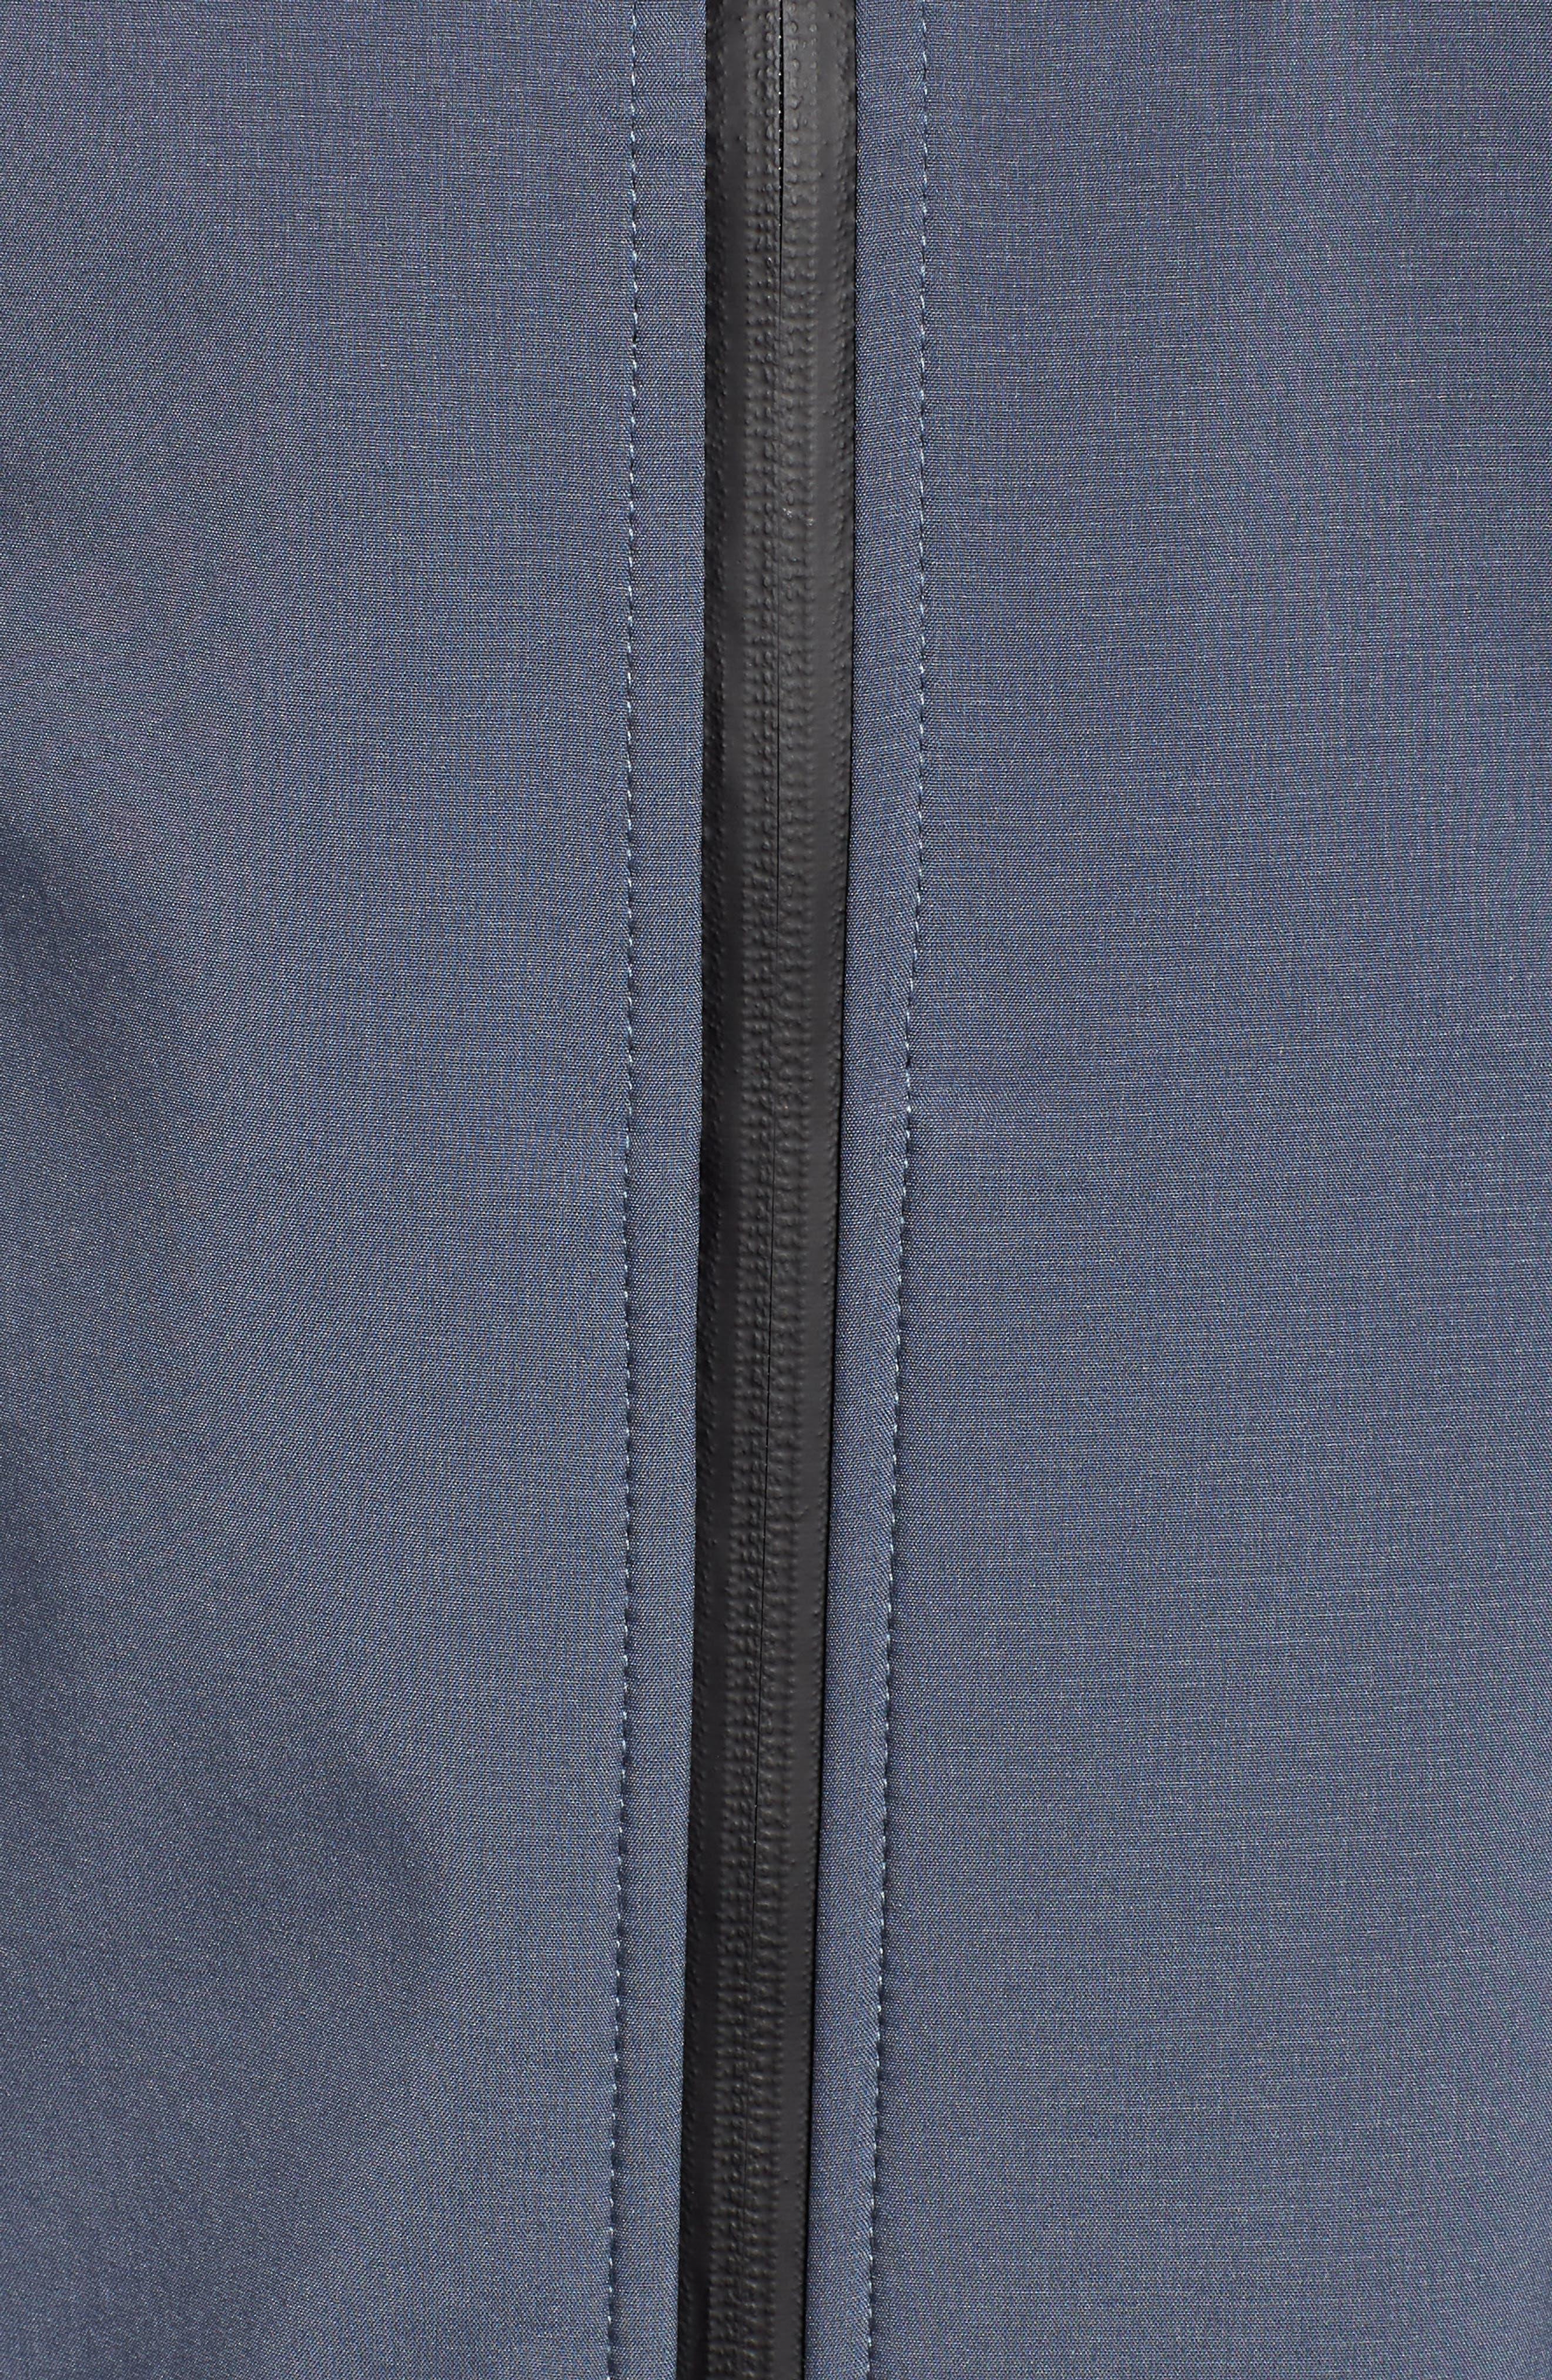 Long Hooded Raincoat,                             Alternate thumbnail 6, color,                             BLUE GRAYNESS